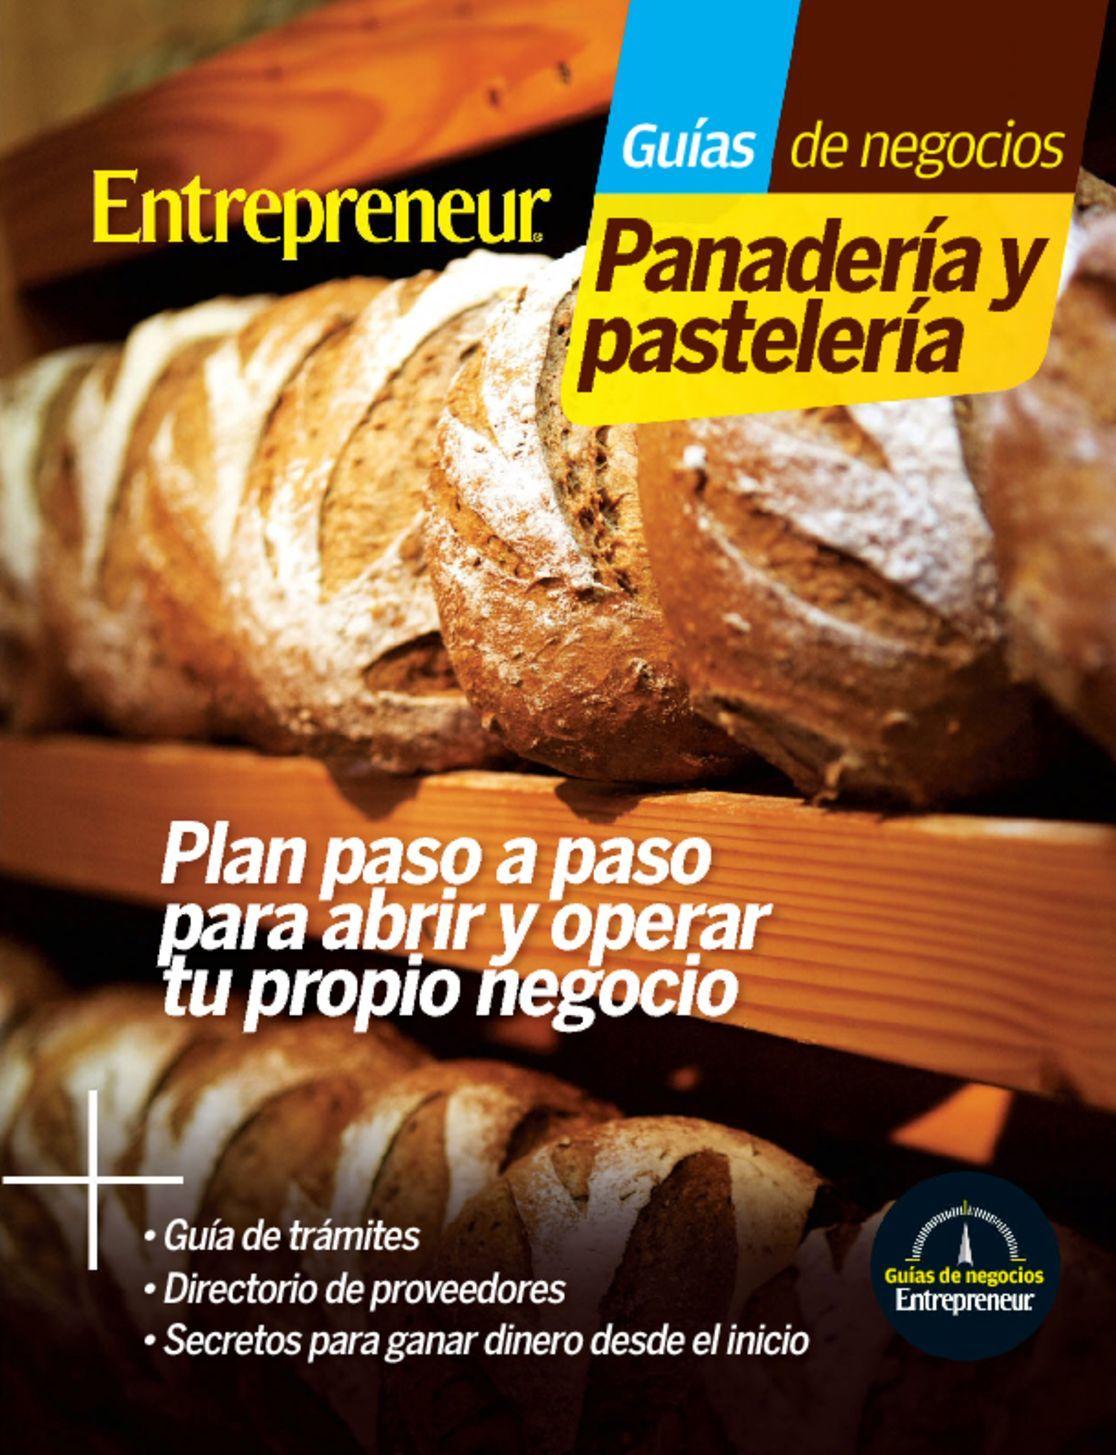 Guías de Negocio Entrepreneur Digital